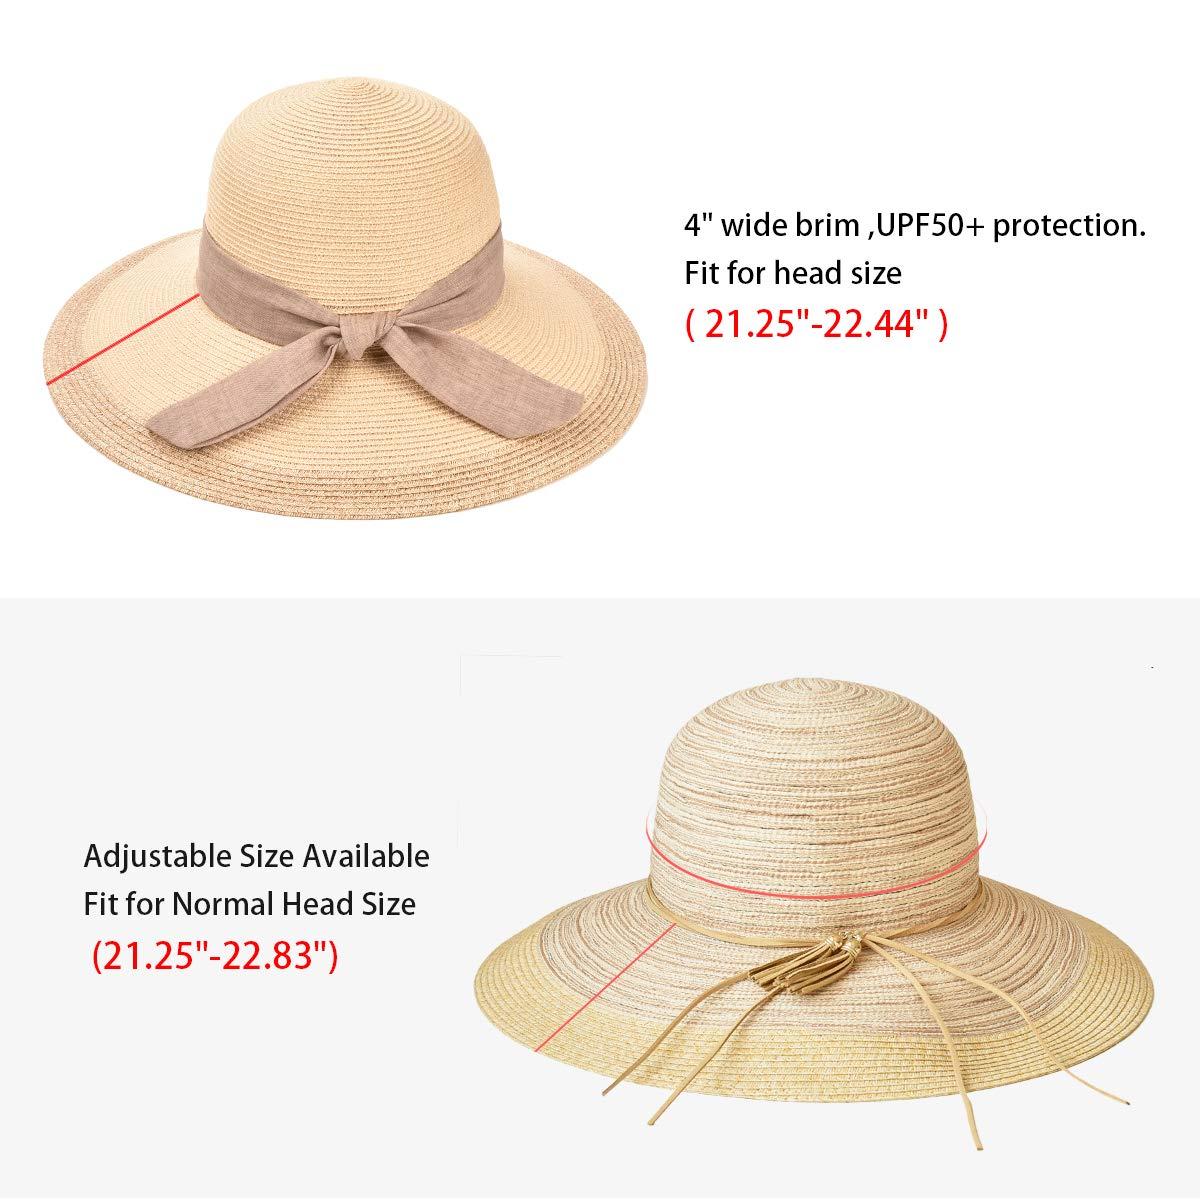 SOMALER Women Floppy Sun Hat Summer Wide Brim Beach Cap Packable Cotton Straw Hat for Travel by SOMALER (Image #4)